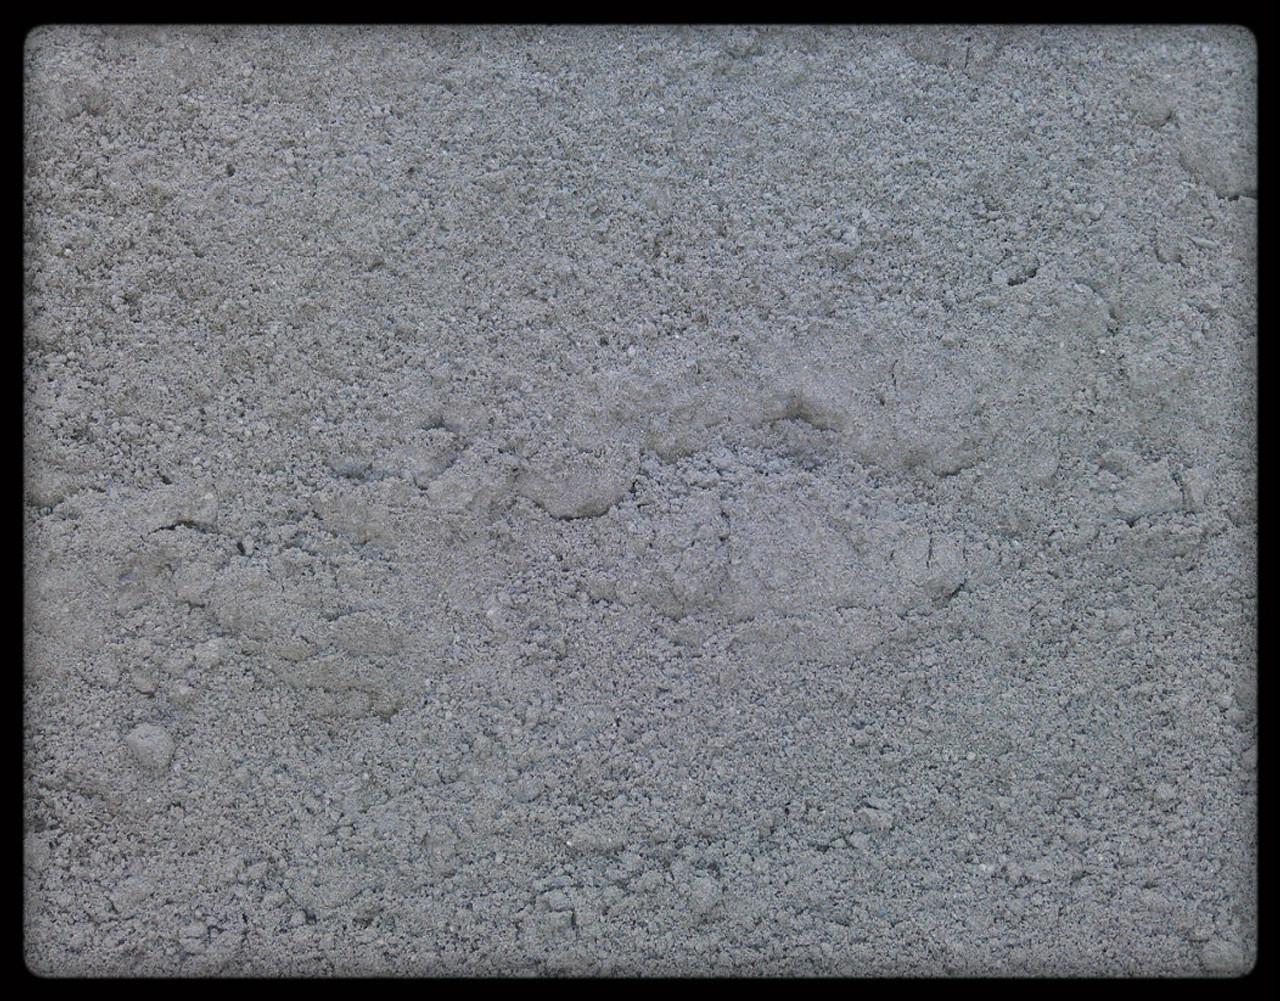 Construction Sand, sechelt sand, corse sand - MyGardenBag